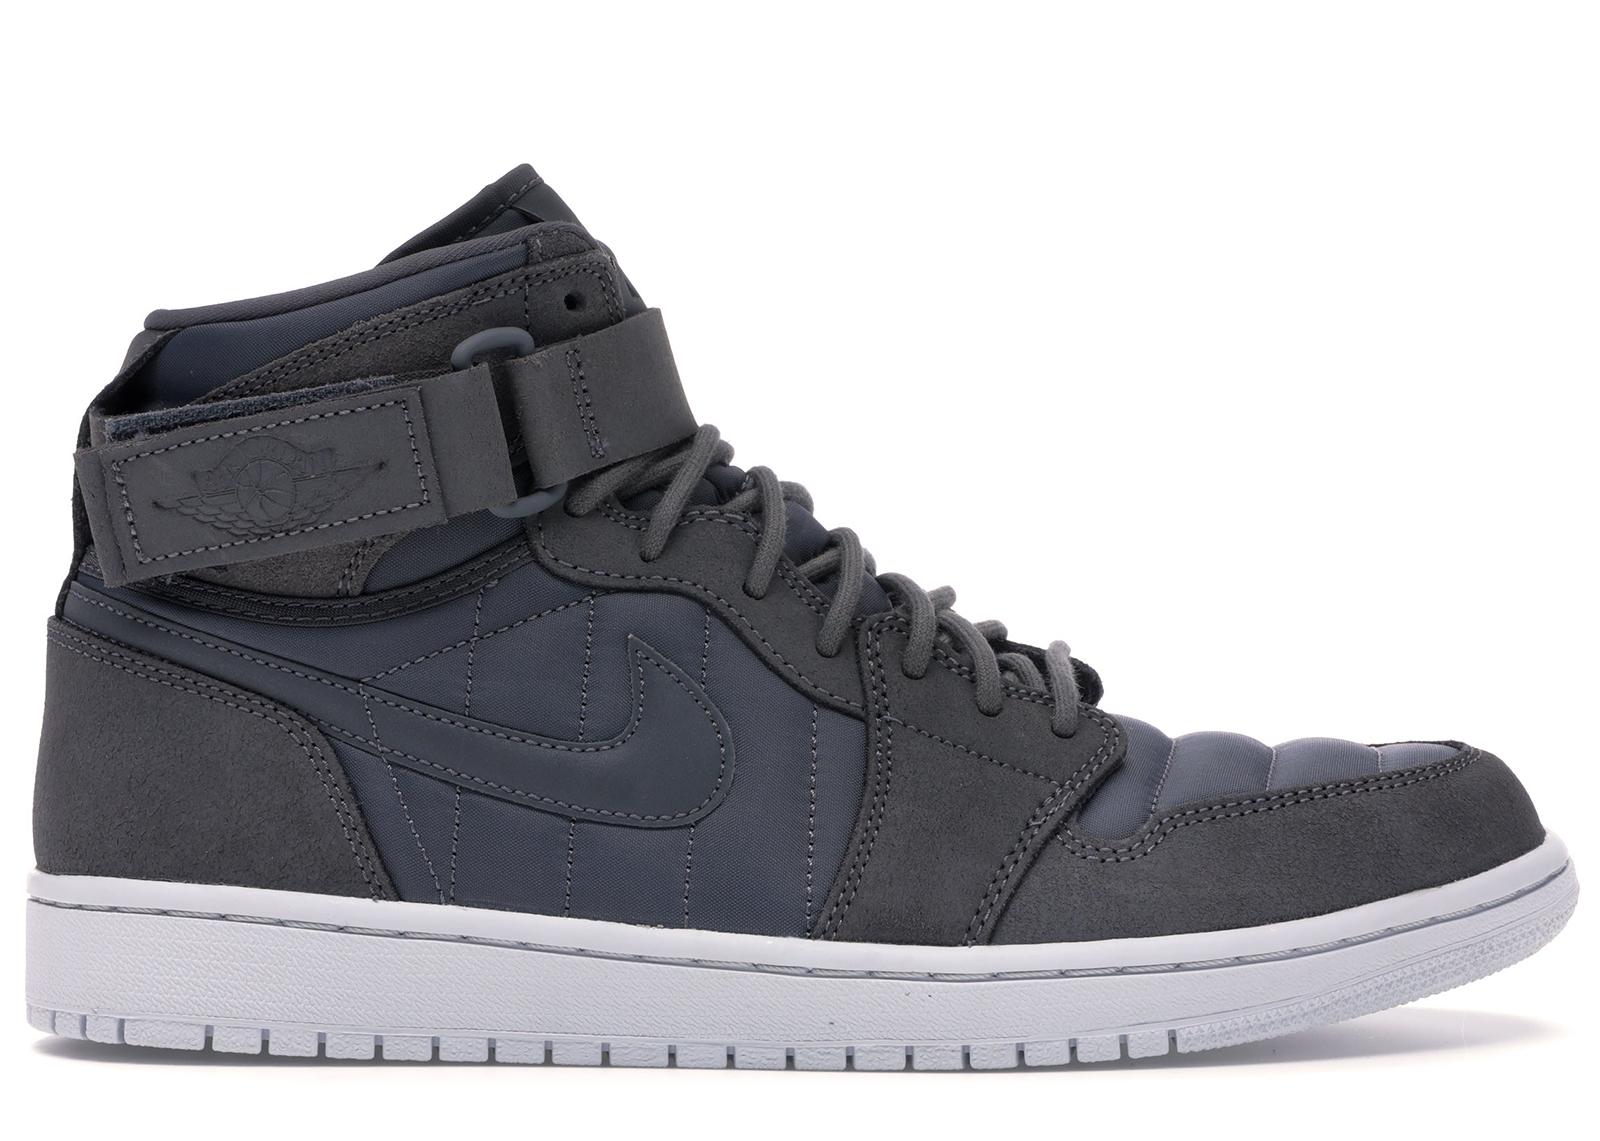 Jordan 1 Retro High Strap Dark Grey